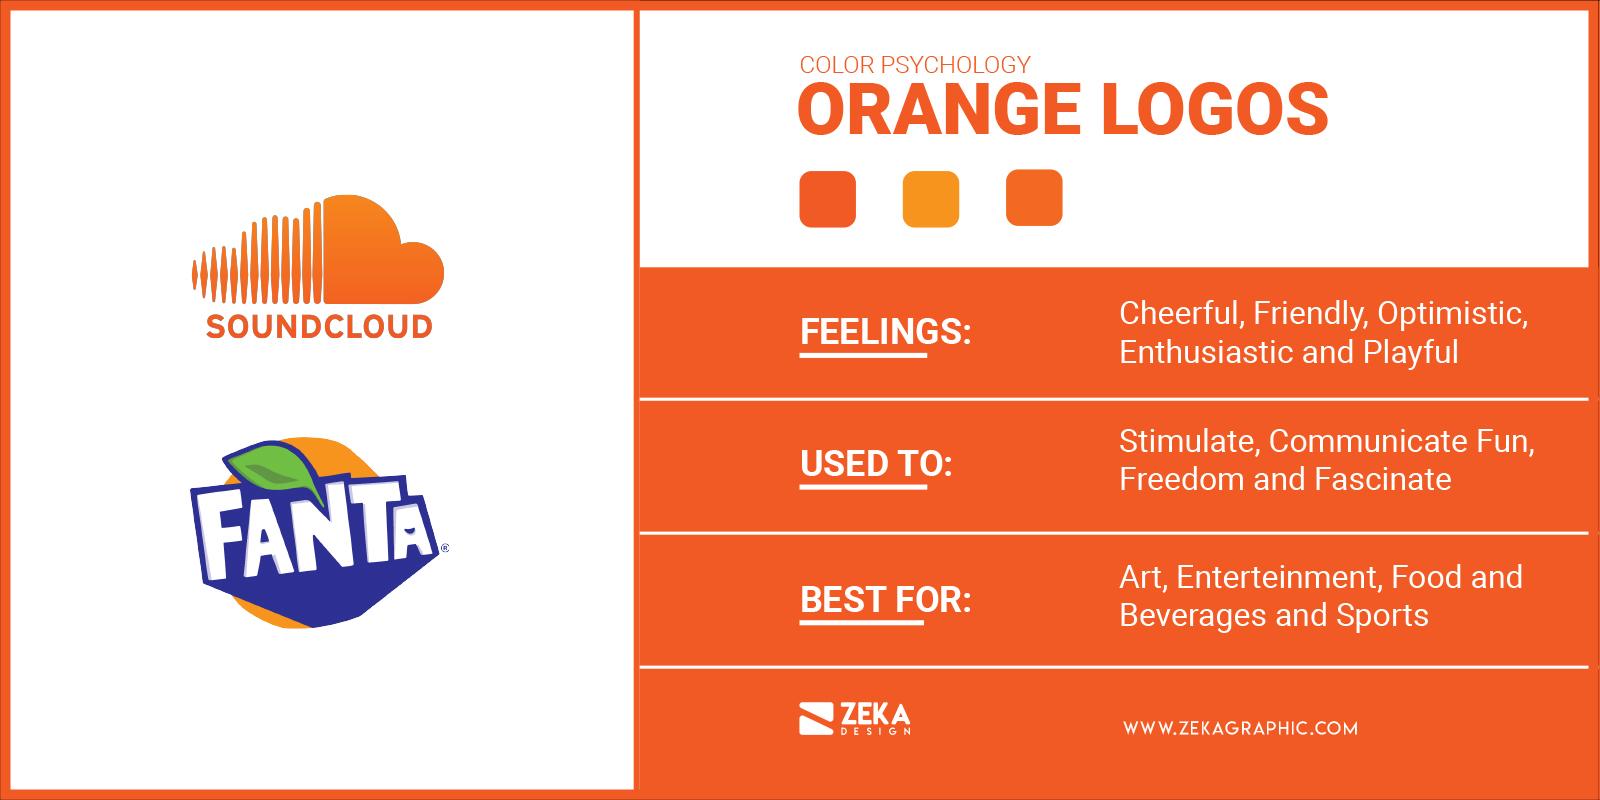 Orange Logos Meaning in Graphic Design